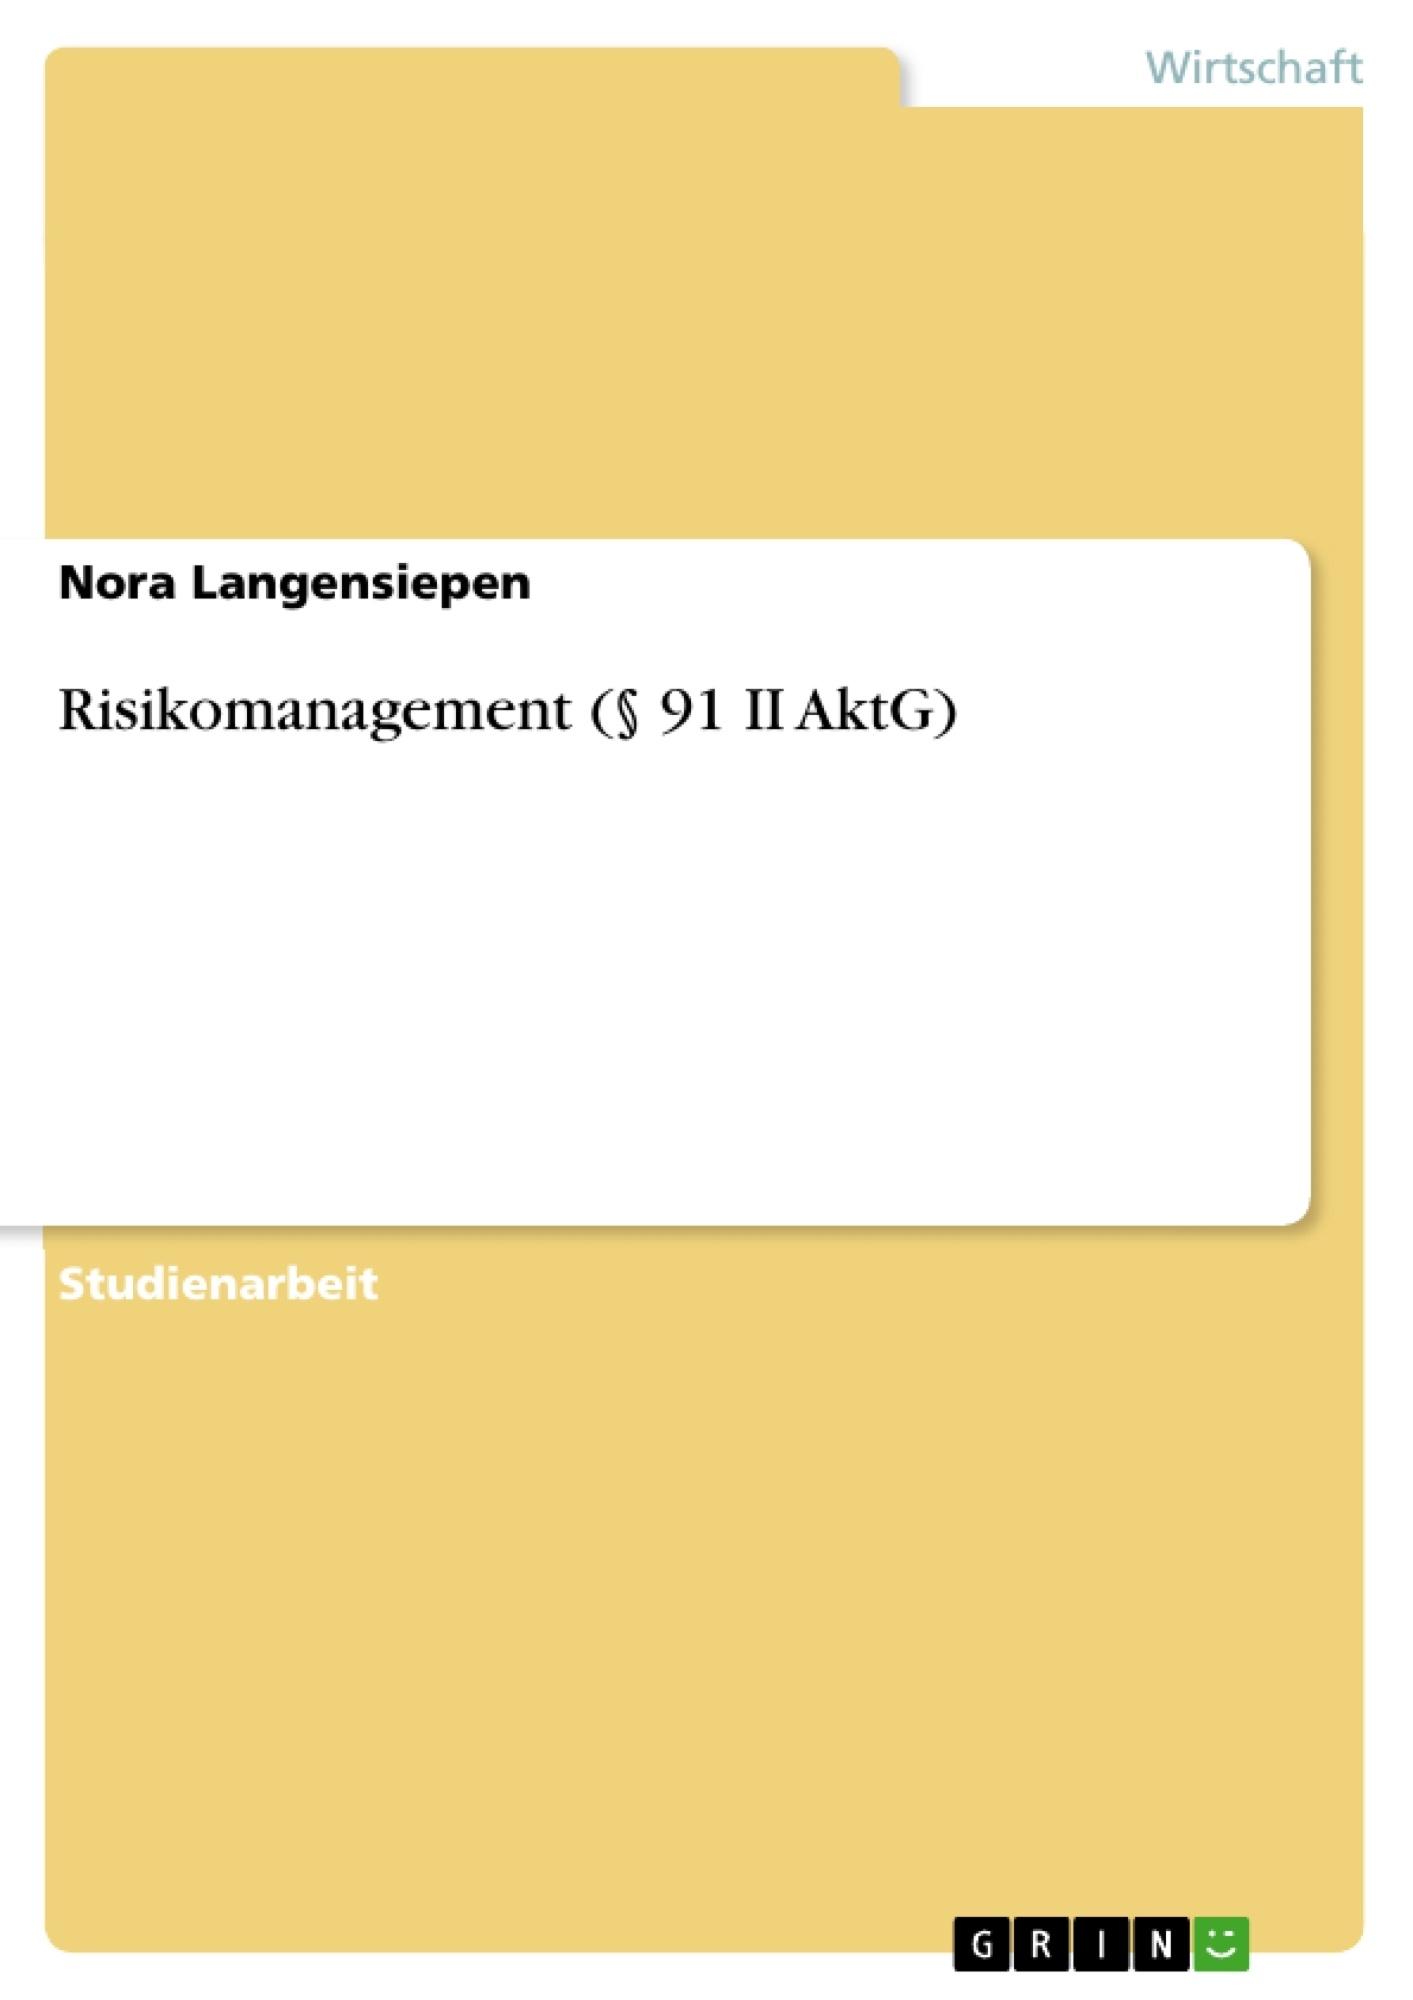 Titel: Risikomanagement (§ 91 II AktG)